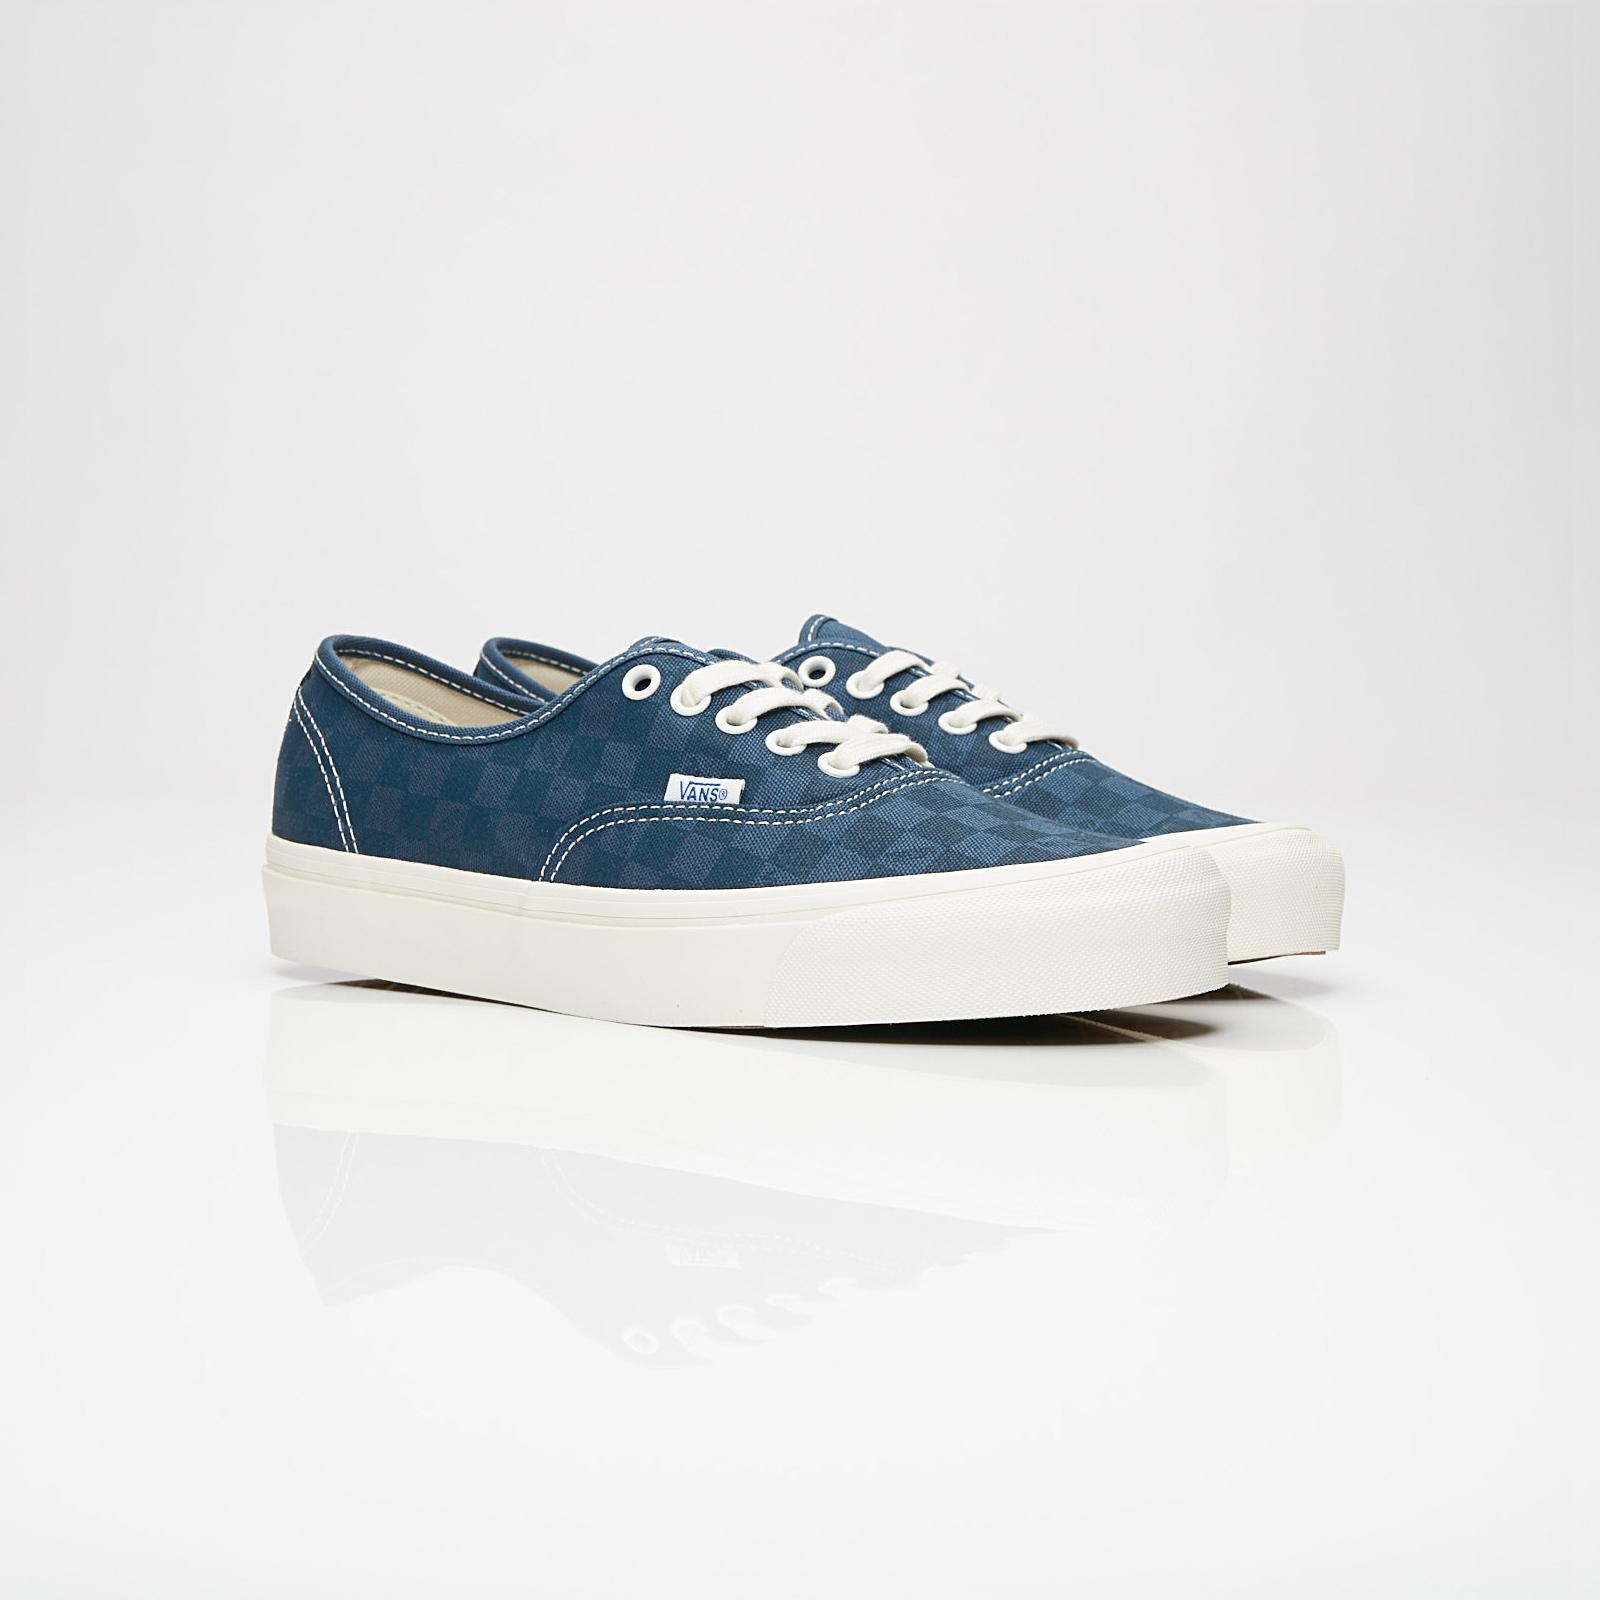 Vans UA OG Authentic LX - V00uddu9j - Sneakersnstuff  9e85b712b